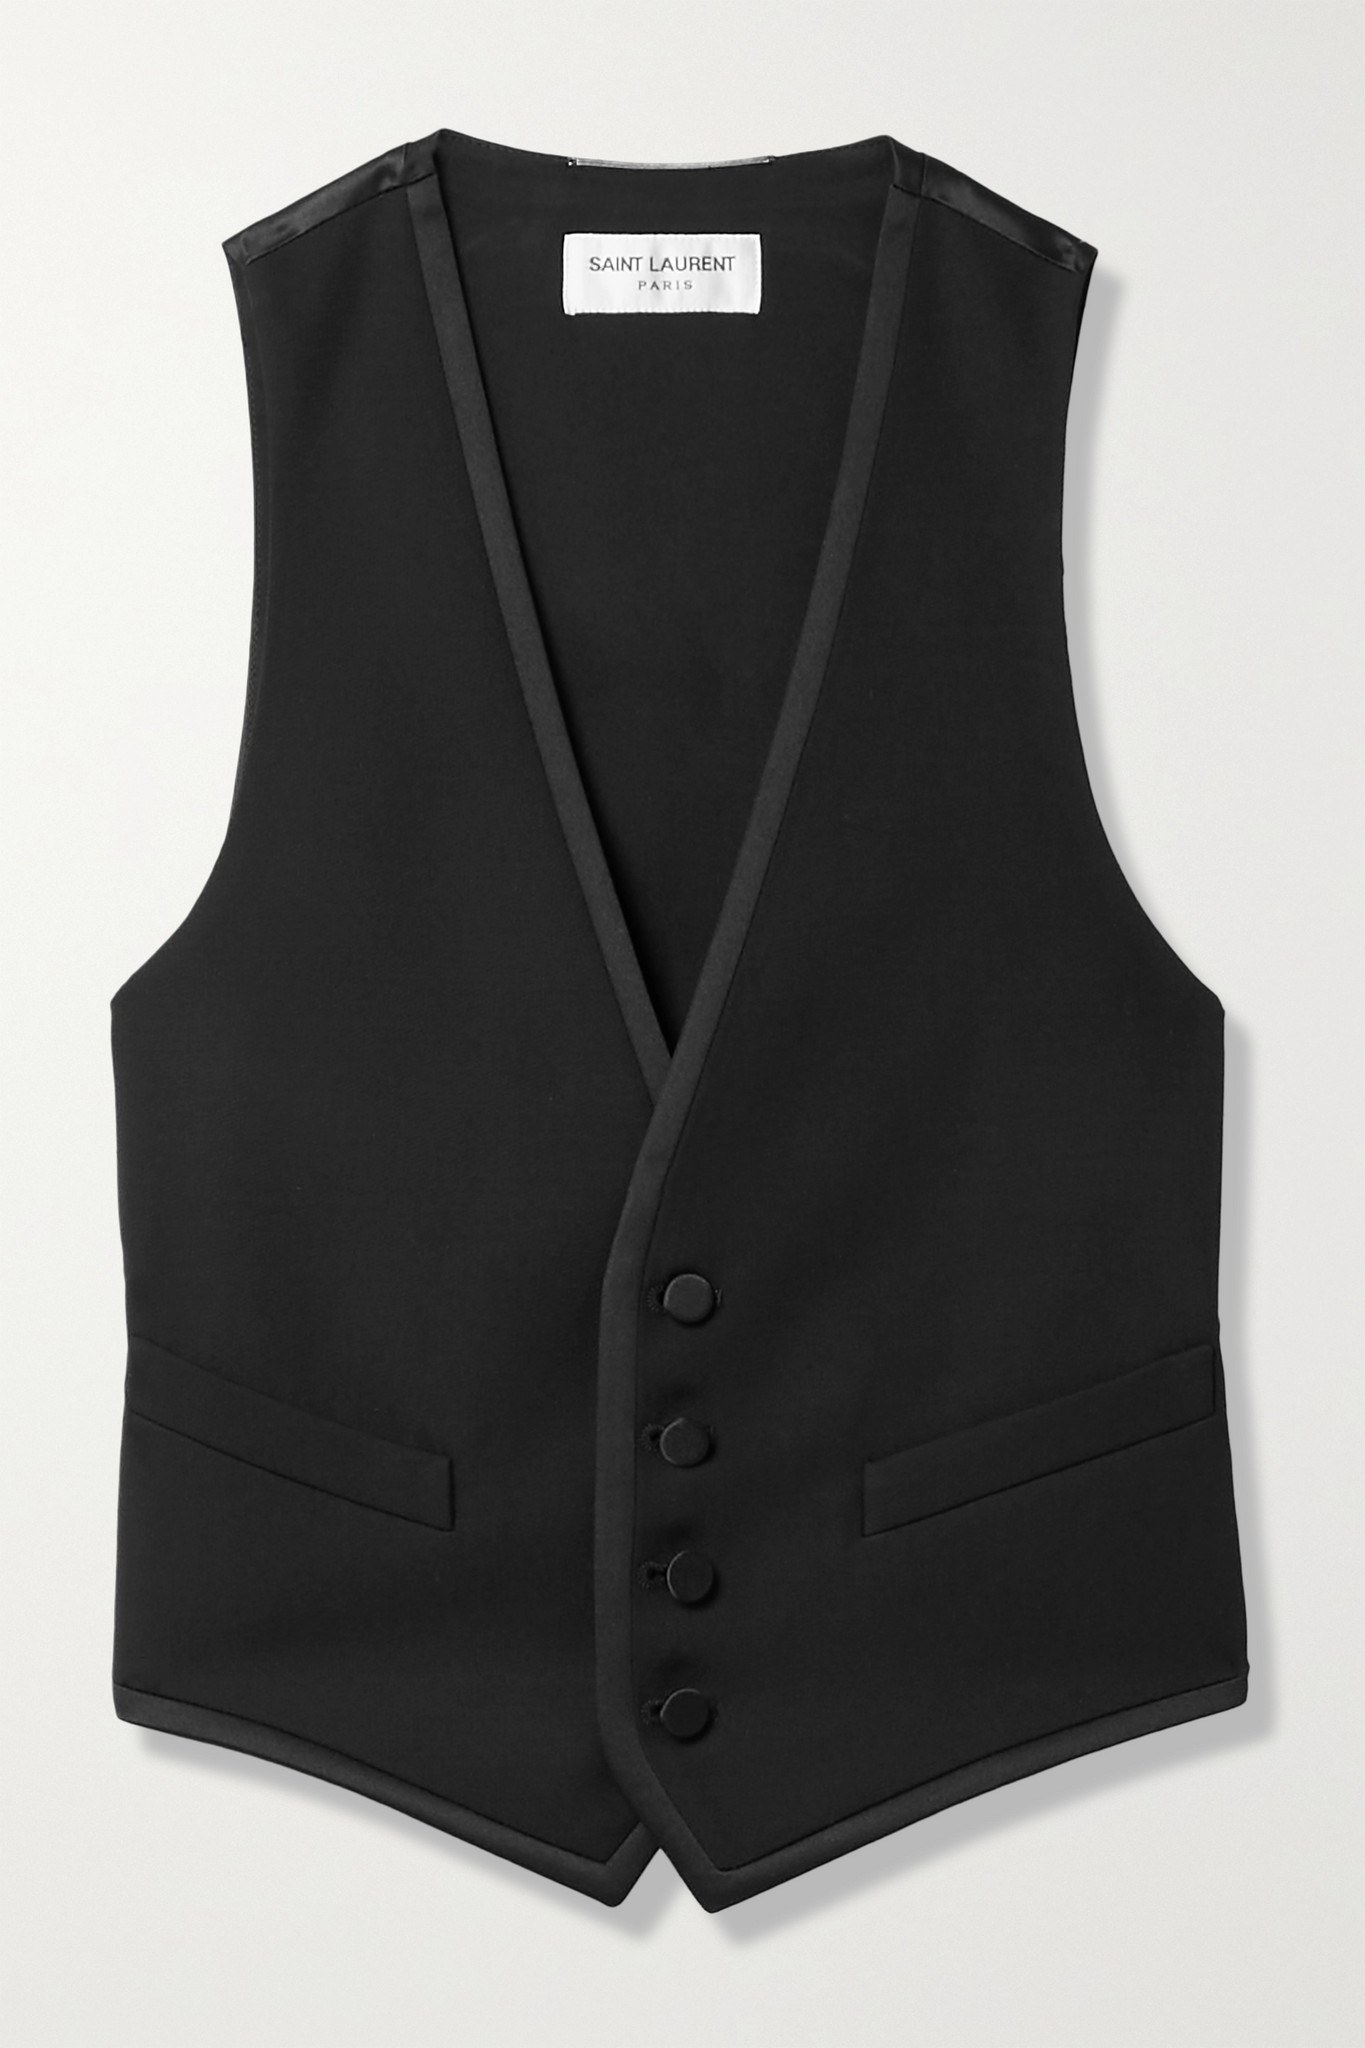 SAINT LAURENT - 粒纹羊毛丝缎短款马甲 - 黑色 - small